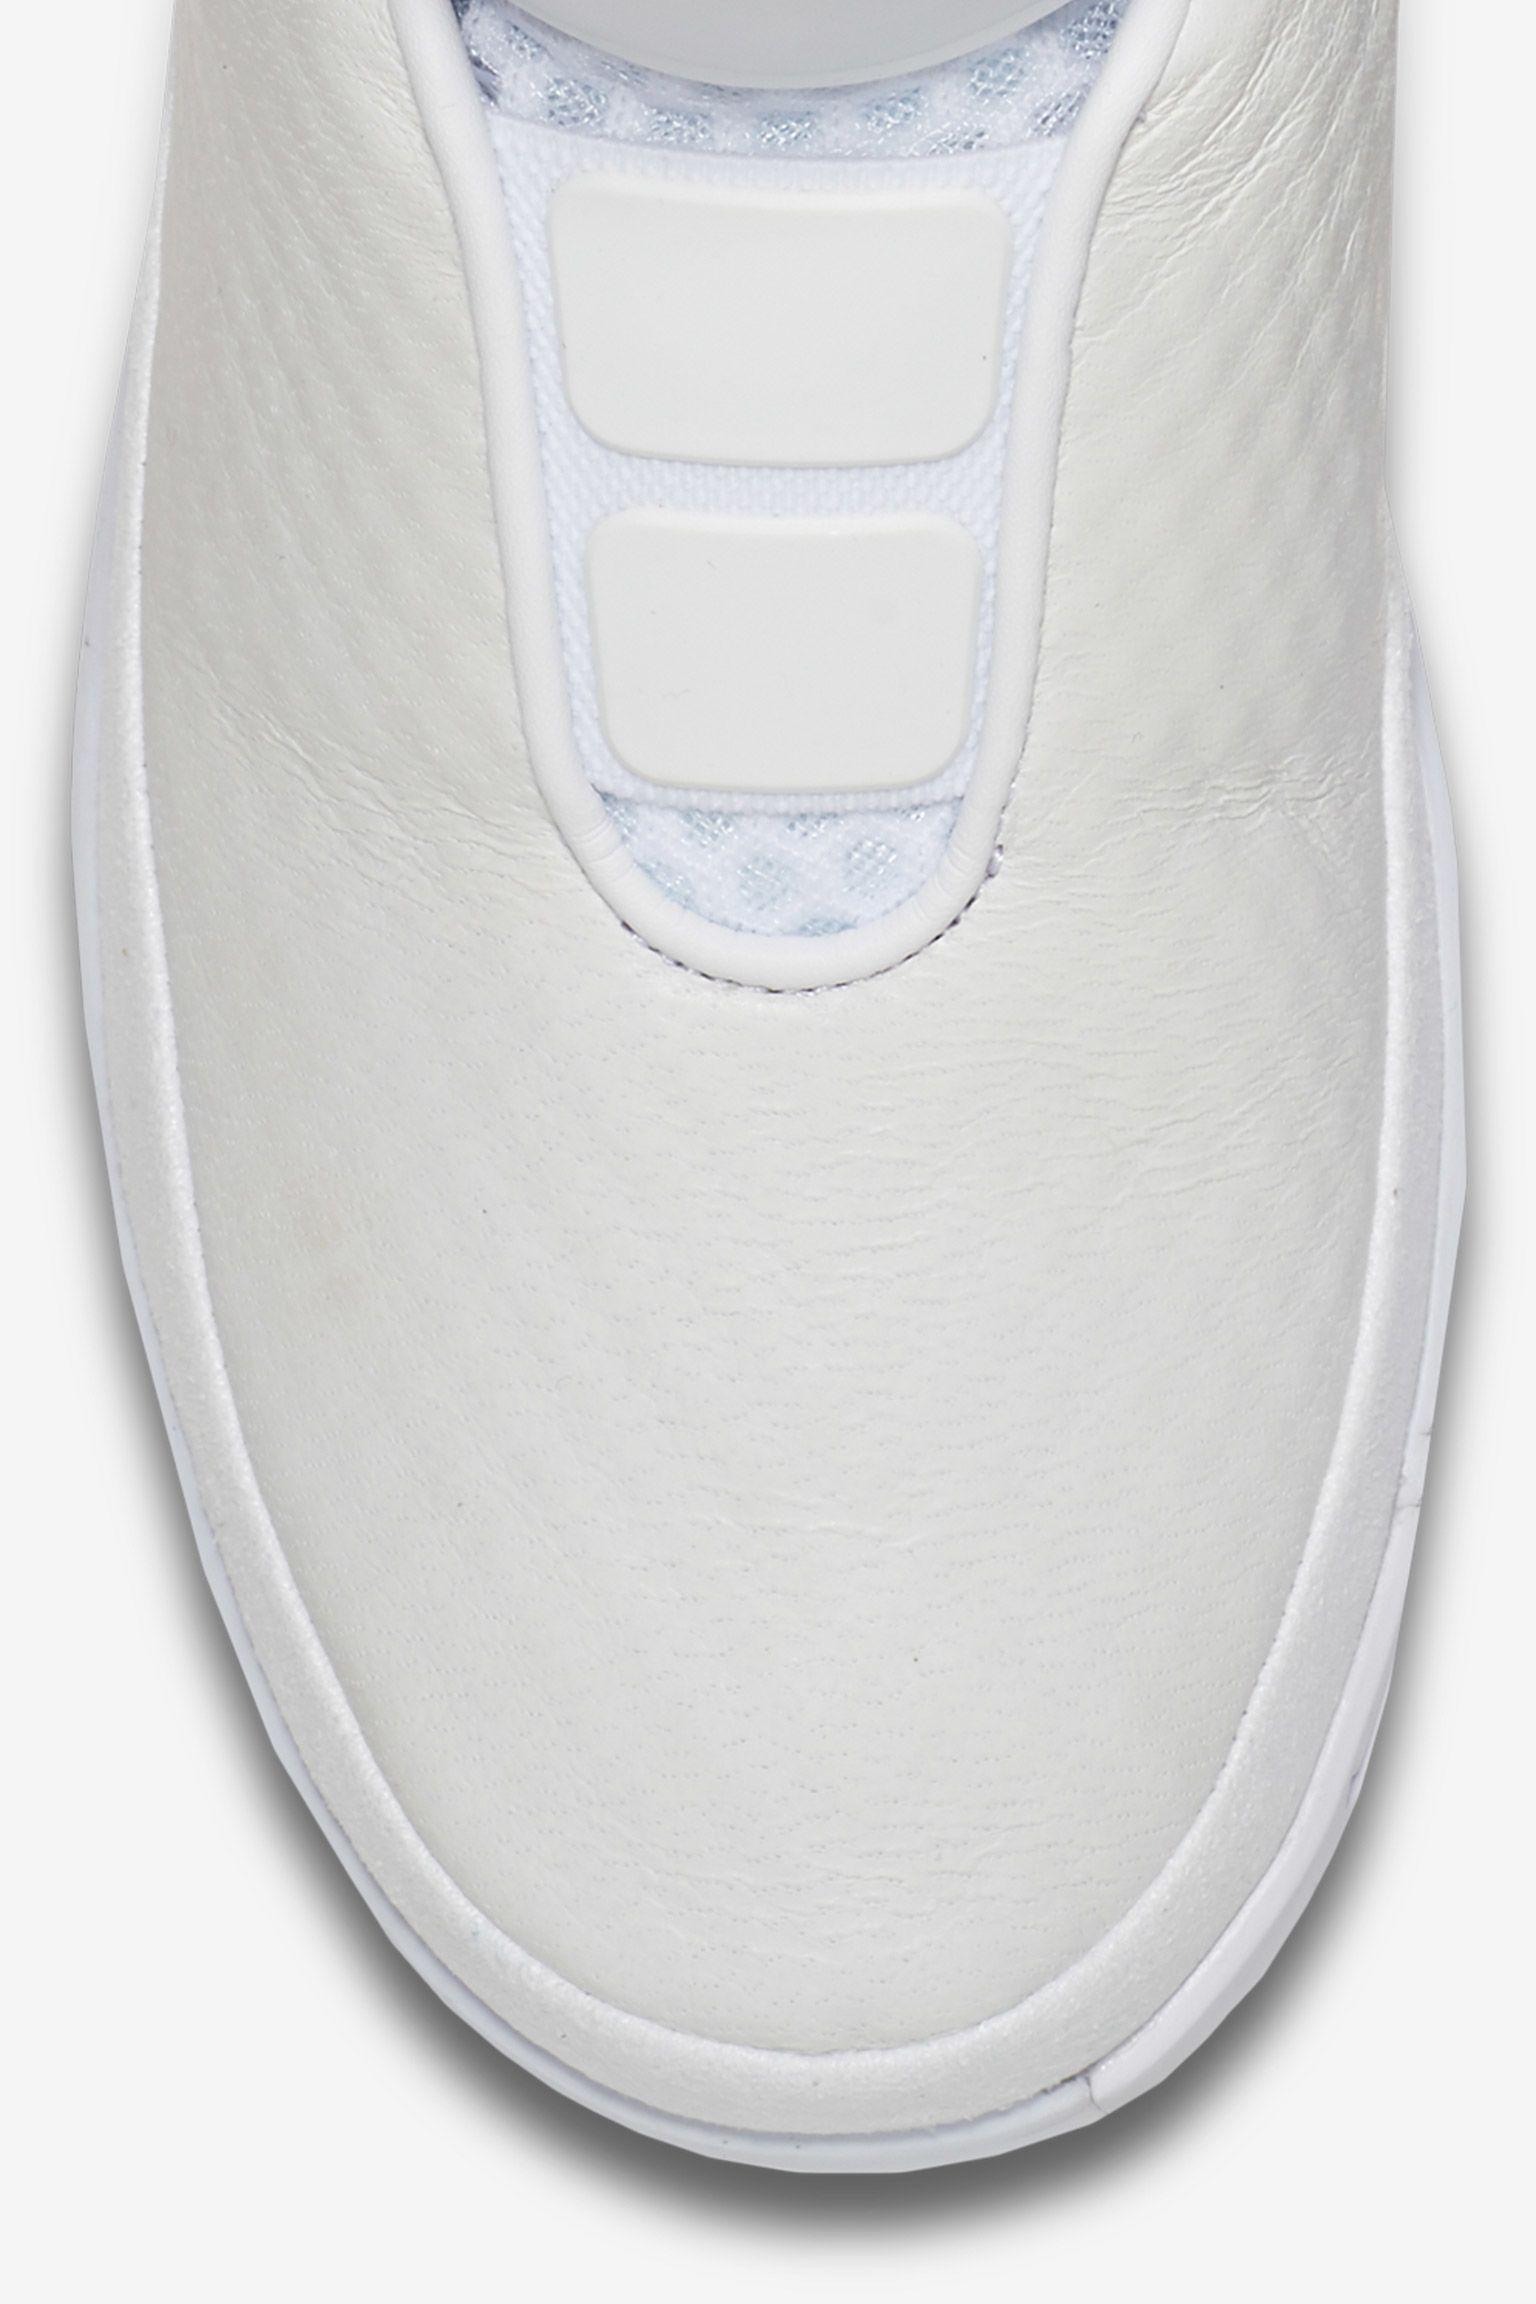 Nike Swoosh HNTR 'On The Hunt' White